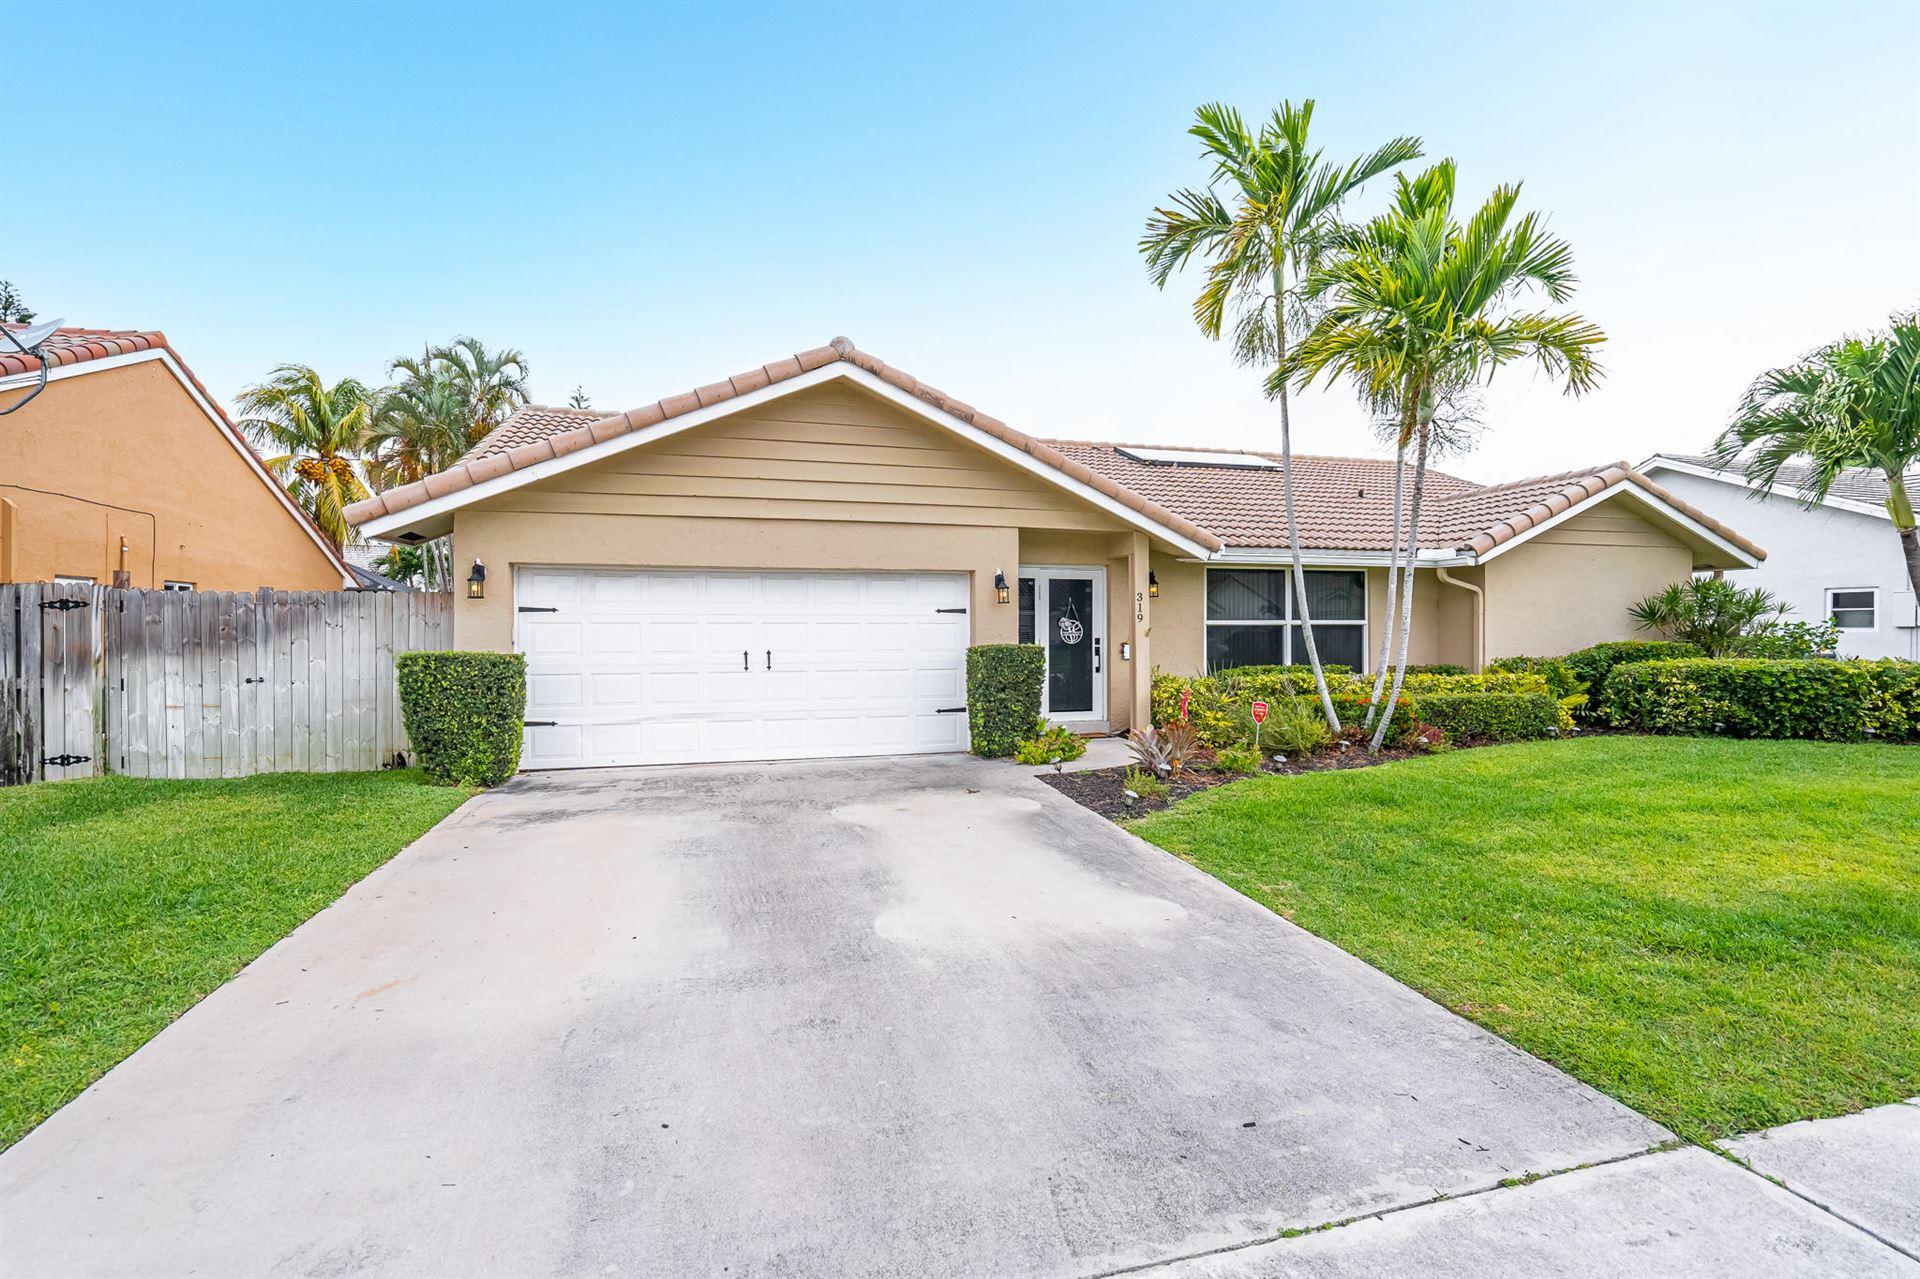 319 Sequoia Lane, Boca Raton, FL 33487 - MLS#: RX-10710089